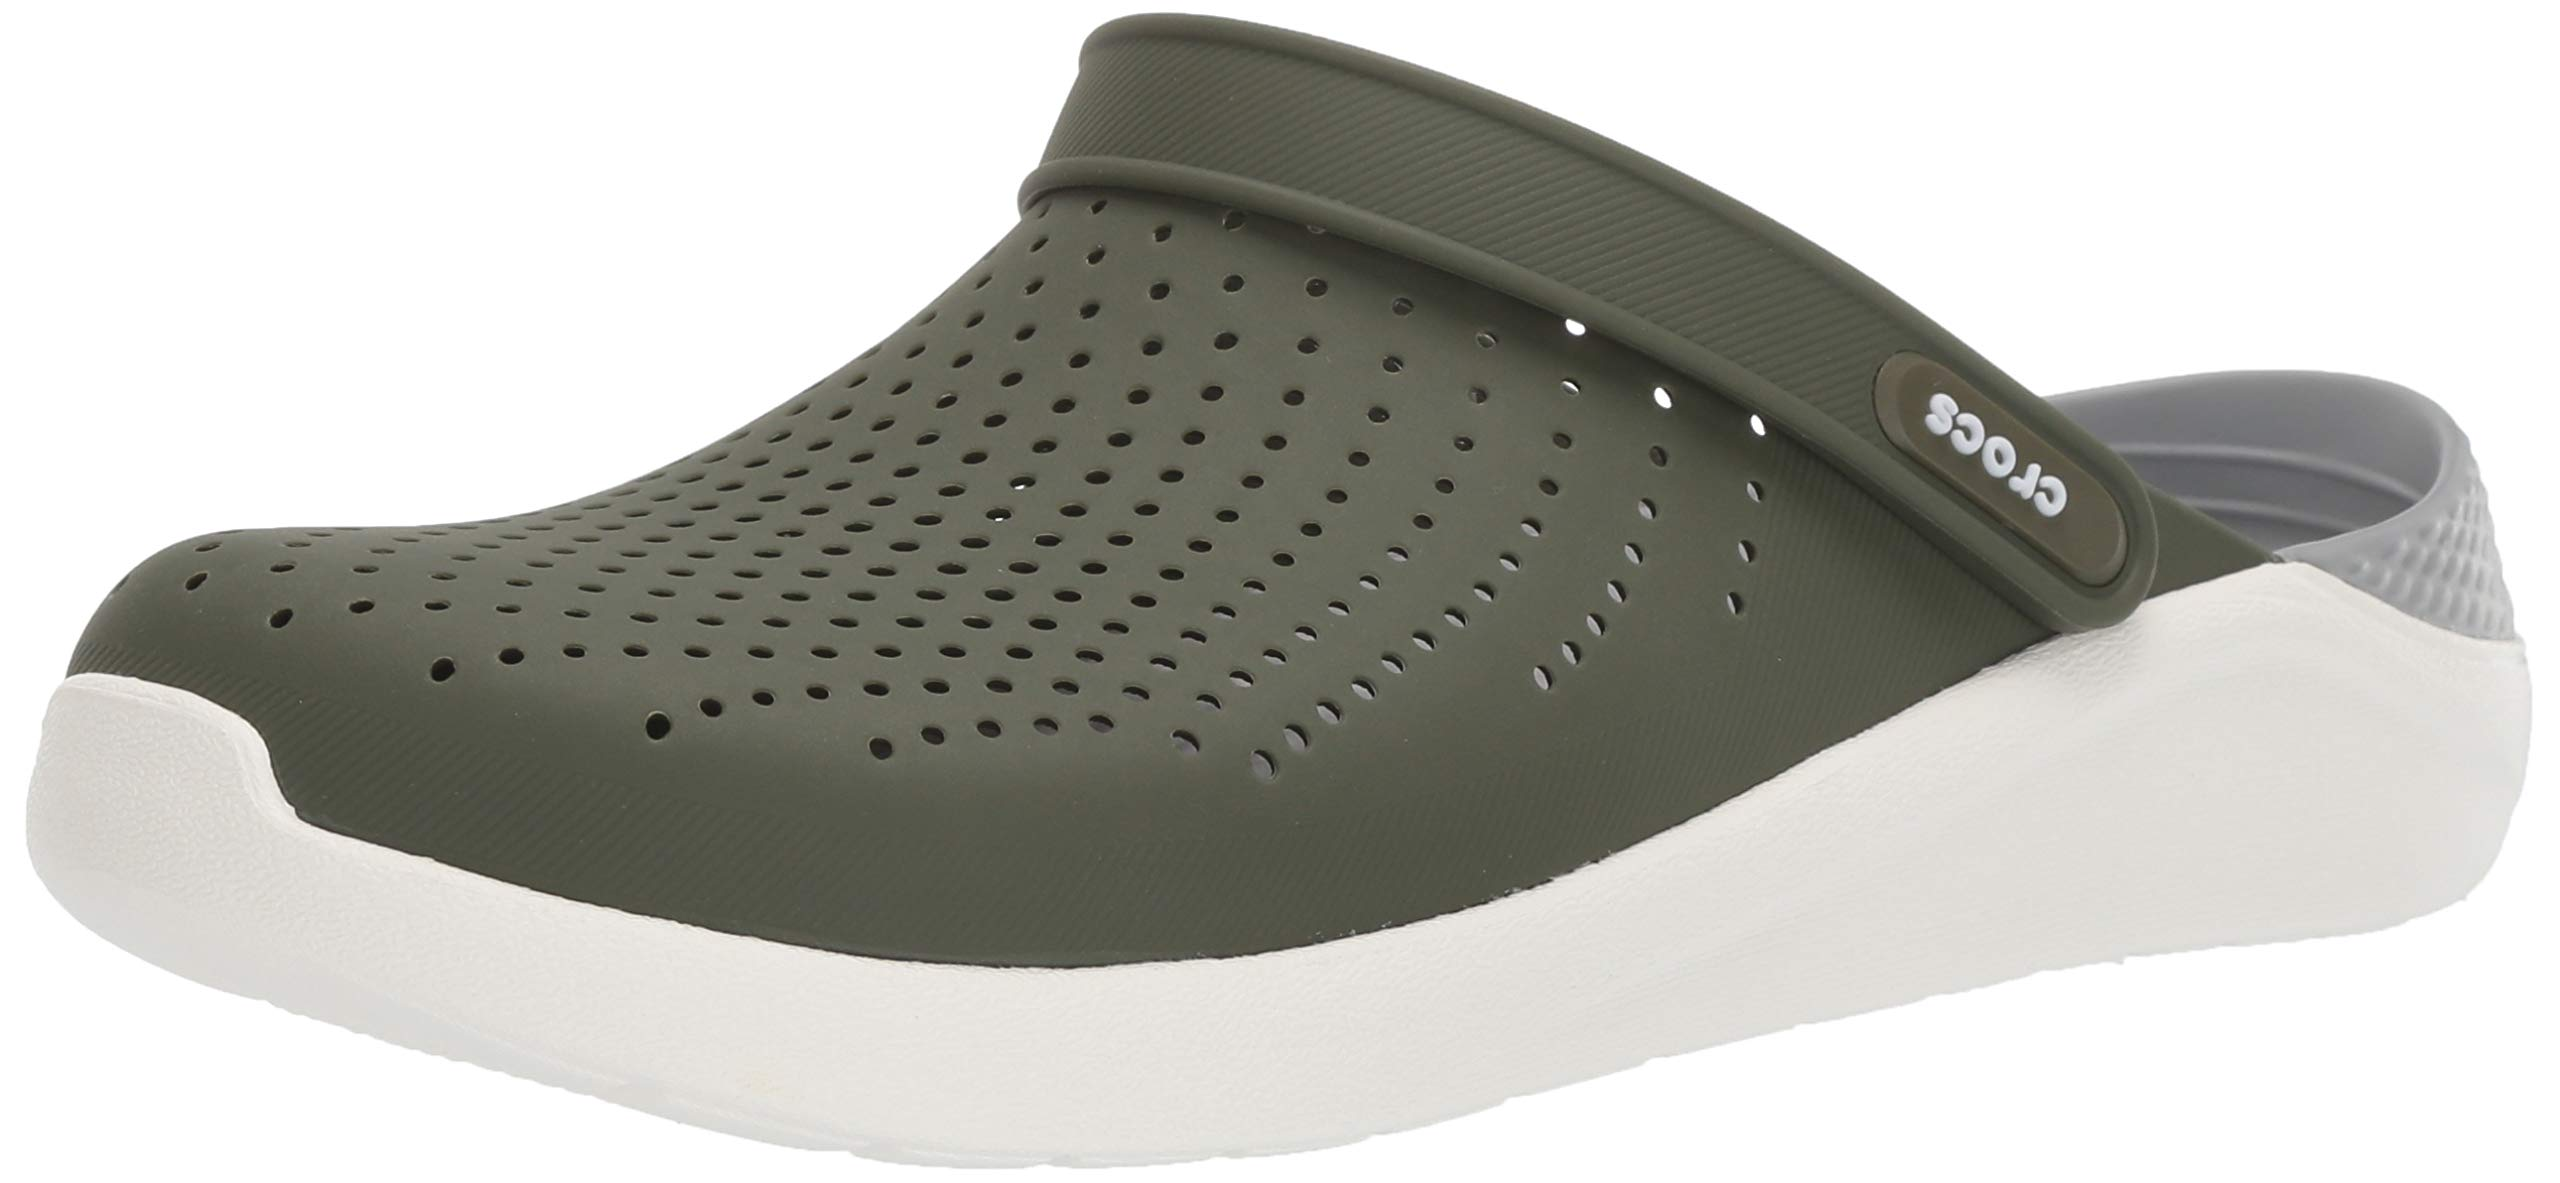 Crocs LiteRide Clog, Army Green/White 14 US Women / 12 US Men M US